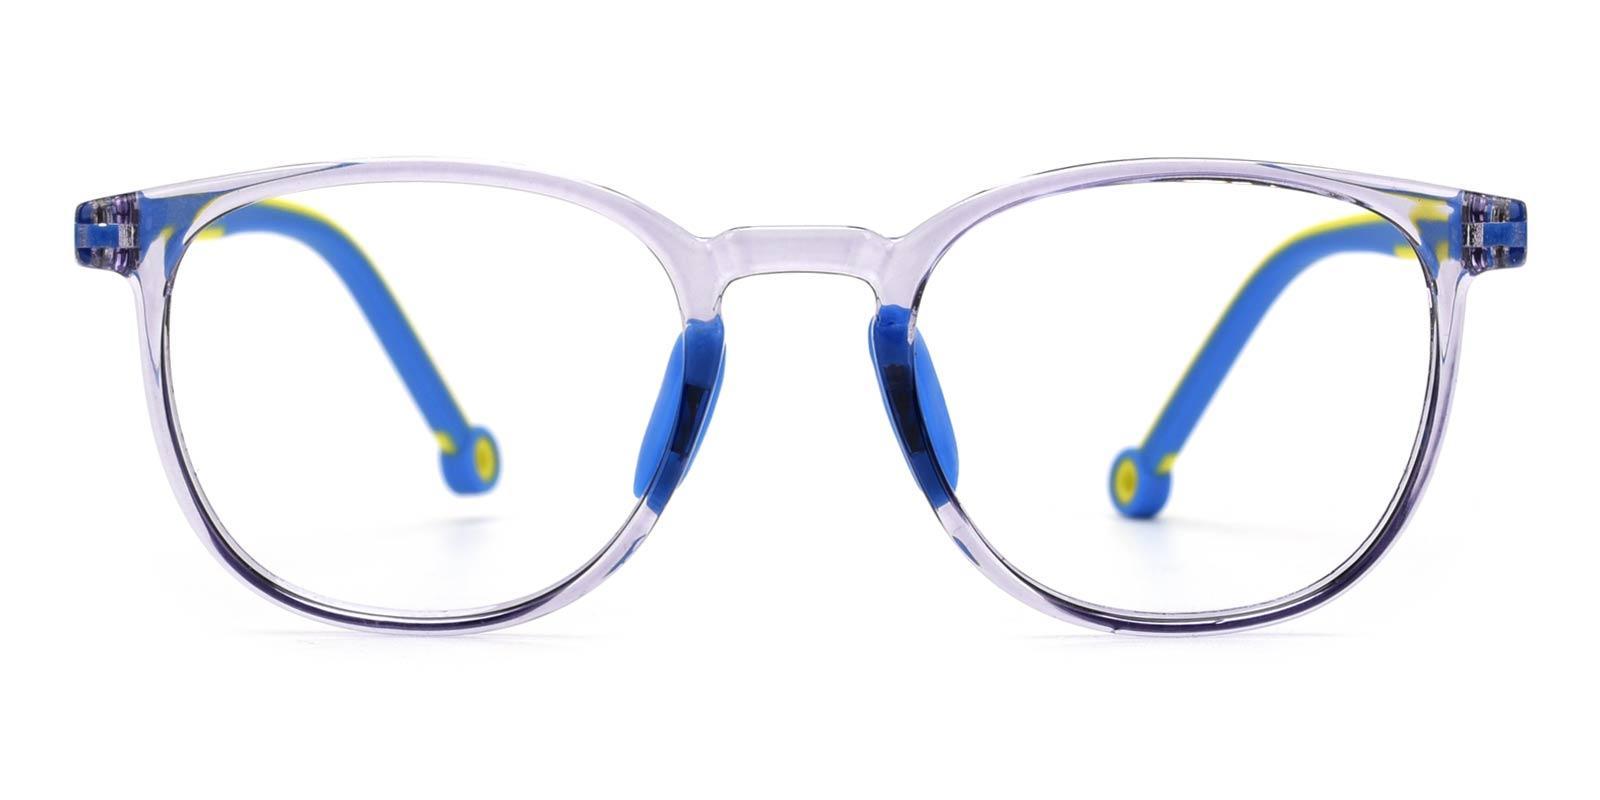 Jennifer-Translucent-Round-Plastic-Eyeglasses-detail